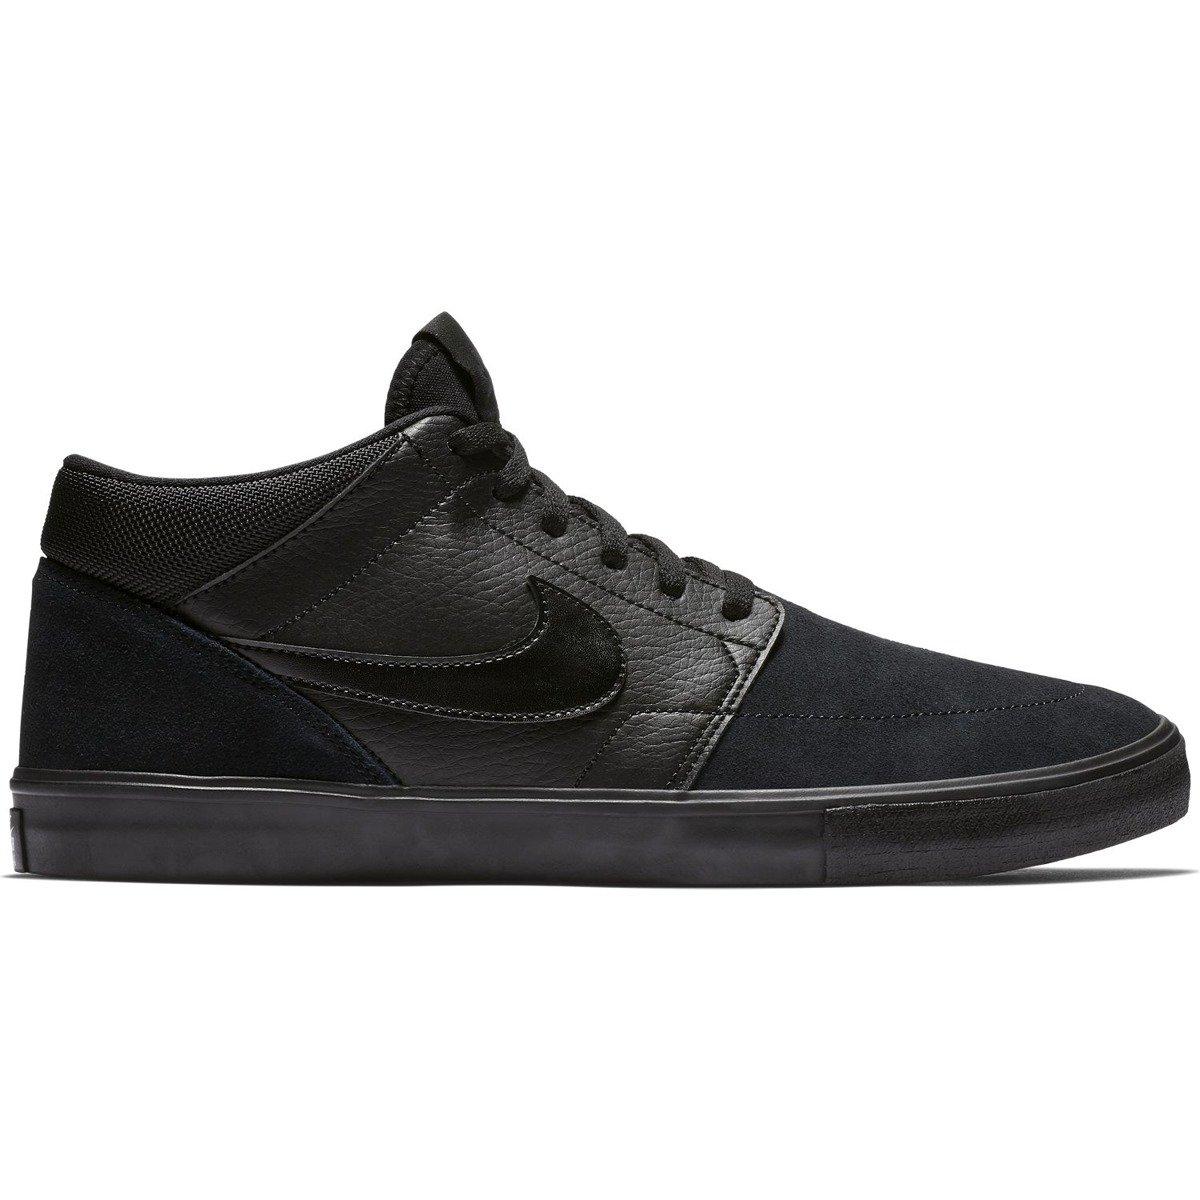 Miniramp Skateshop Buty Nike Sb Solarsoft Portmore Ii Mid